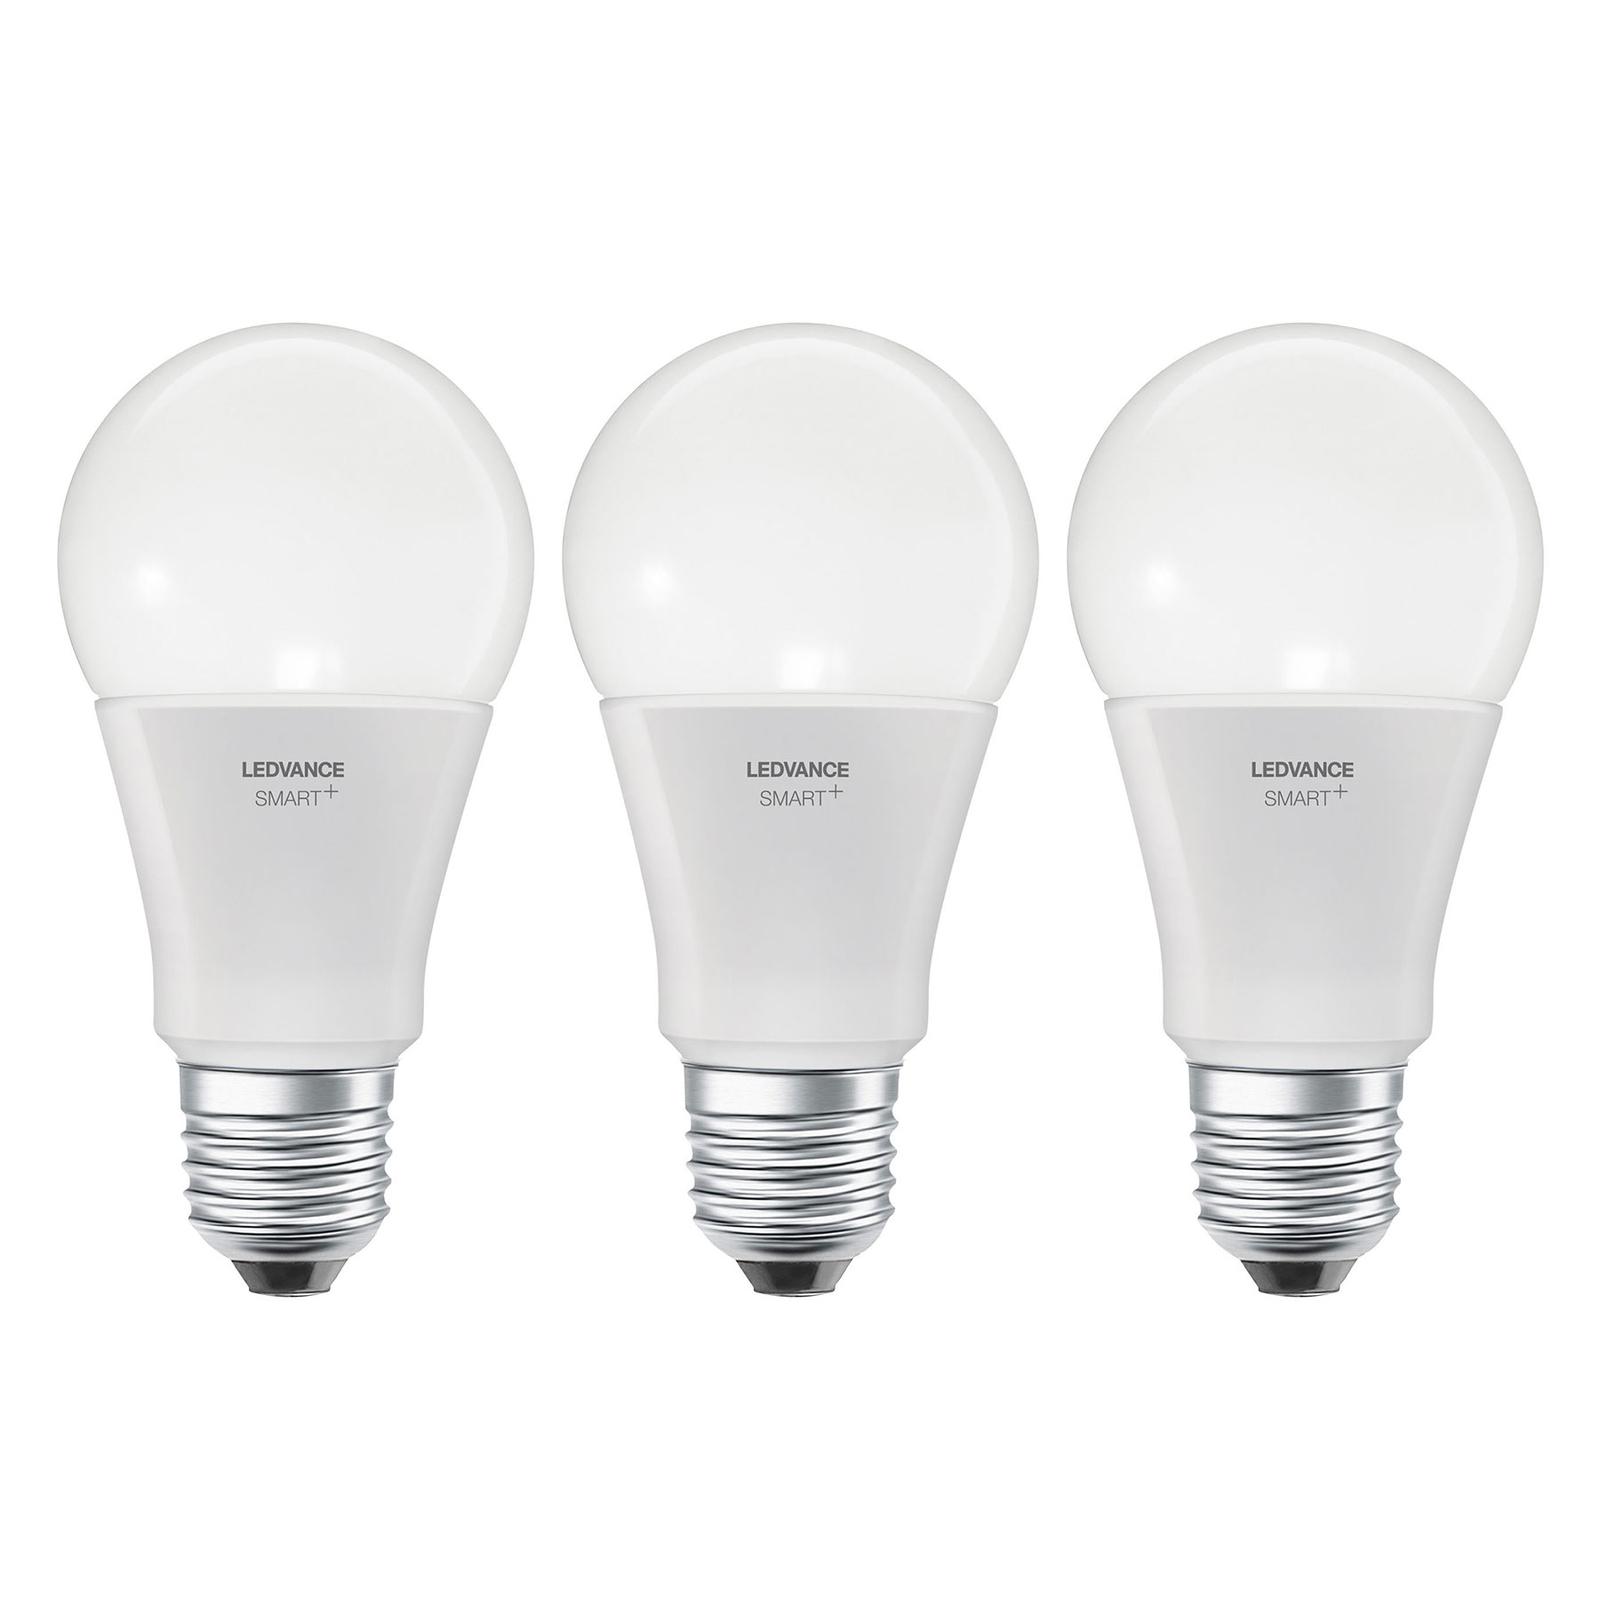 LEDVANCE SMART+ WiFi E27 9W Classic CCT 3szt.